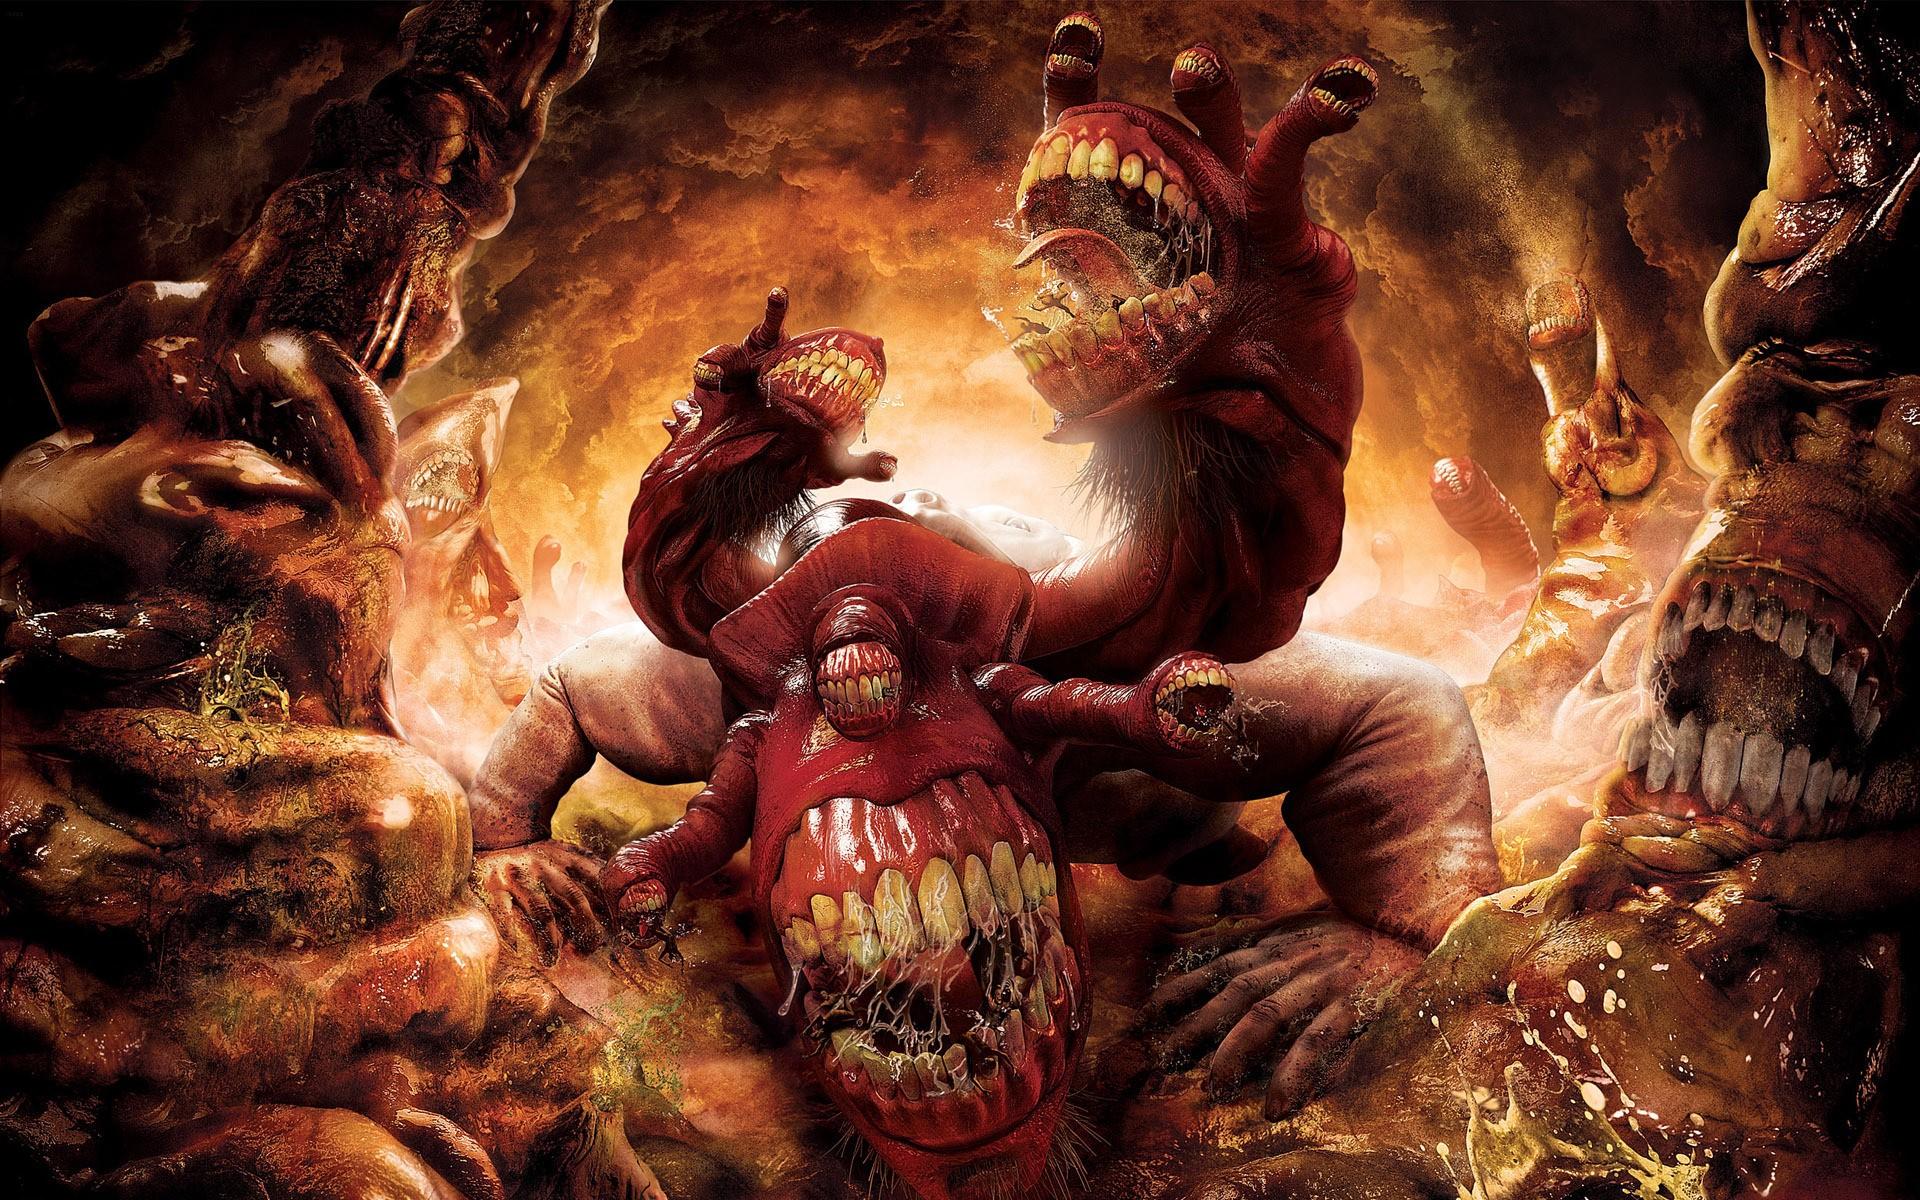 Hell Gluttony Wallpaper 1920x1200 Hell Gluttony Digital Art Dantes 1920x1200